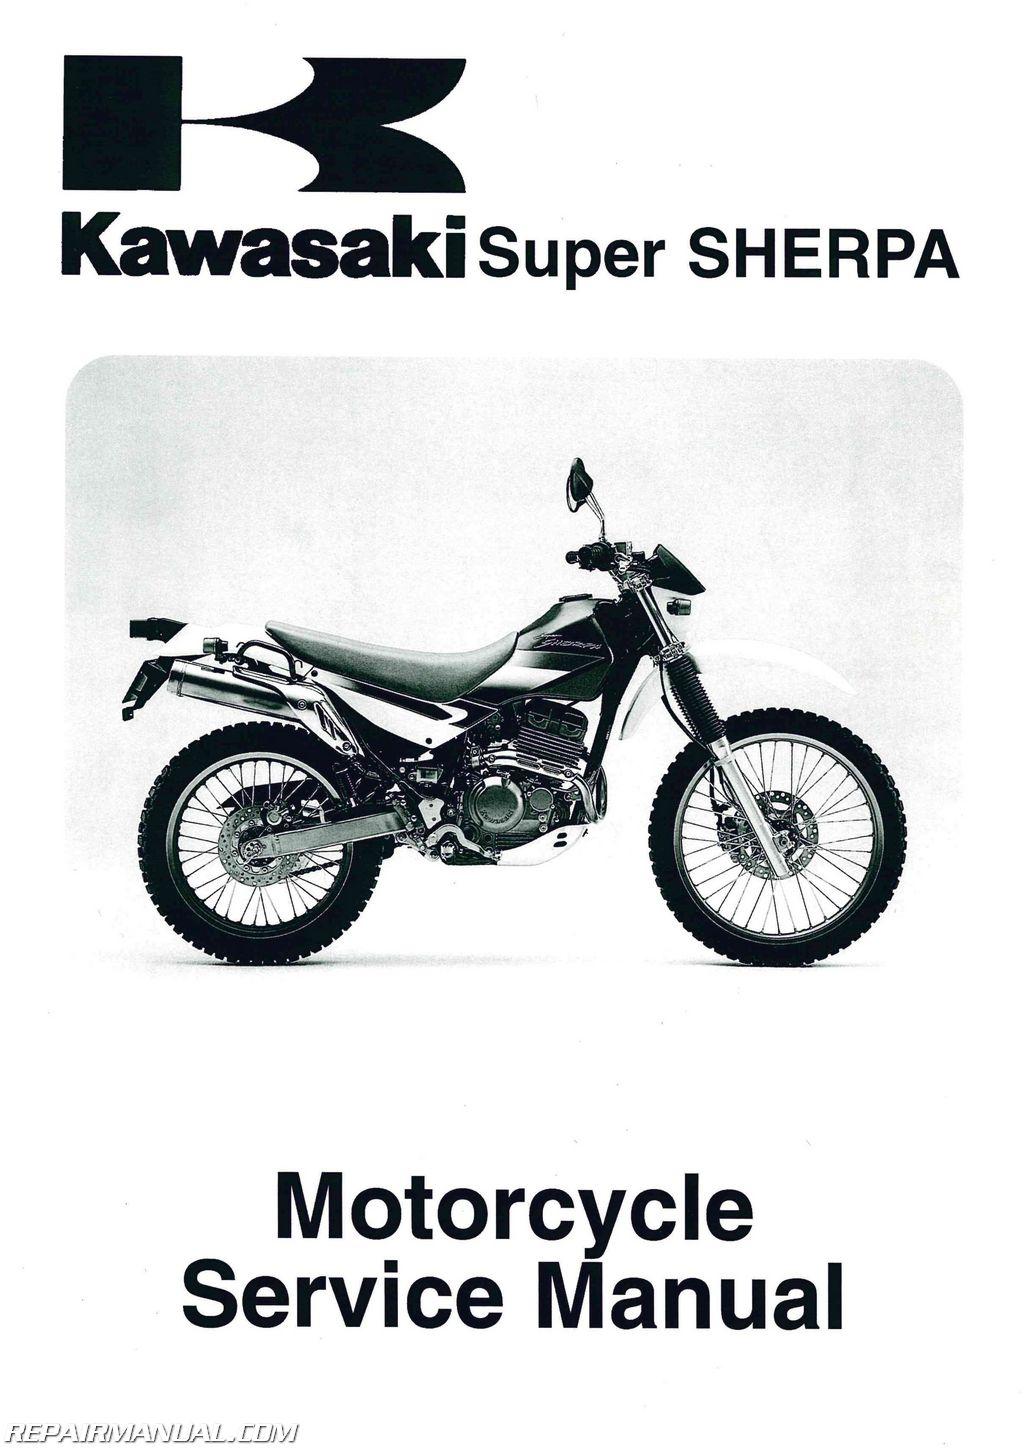 Kawasaki Super Sherpa Owners Manual